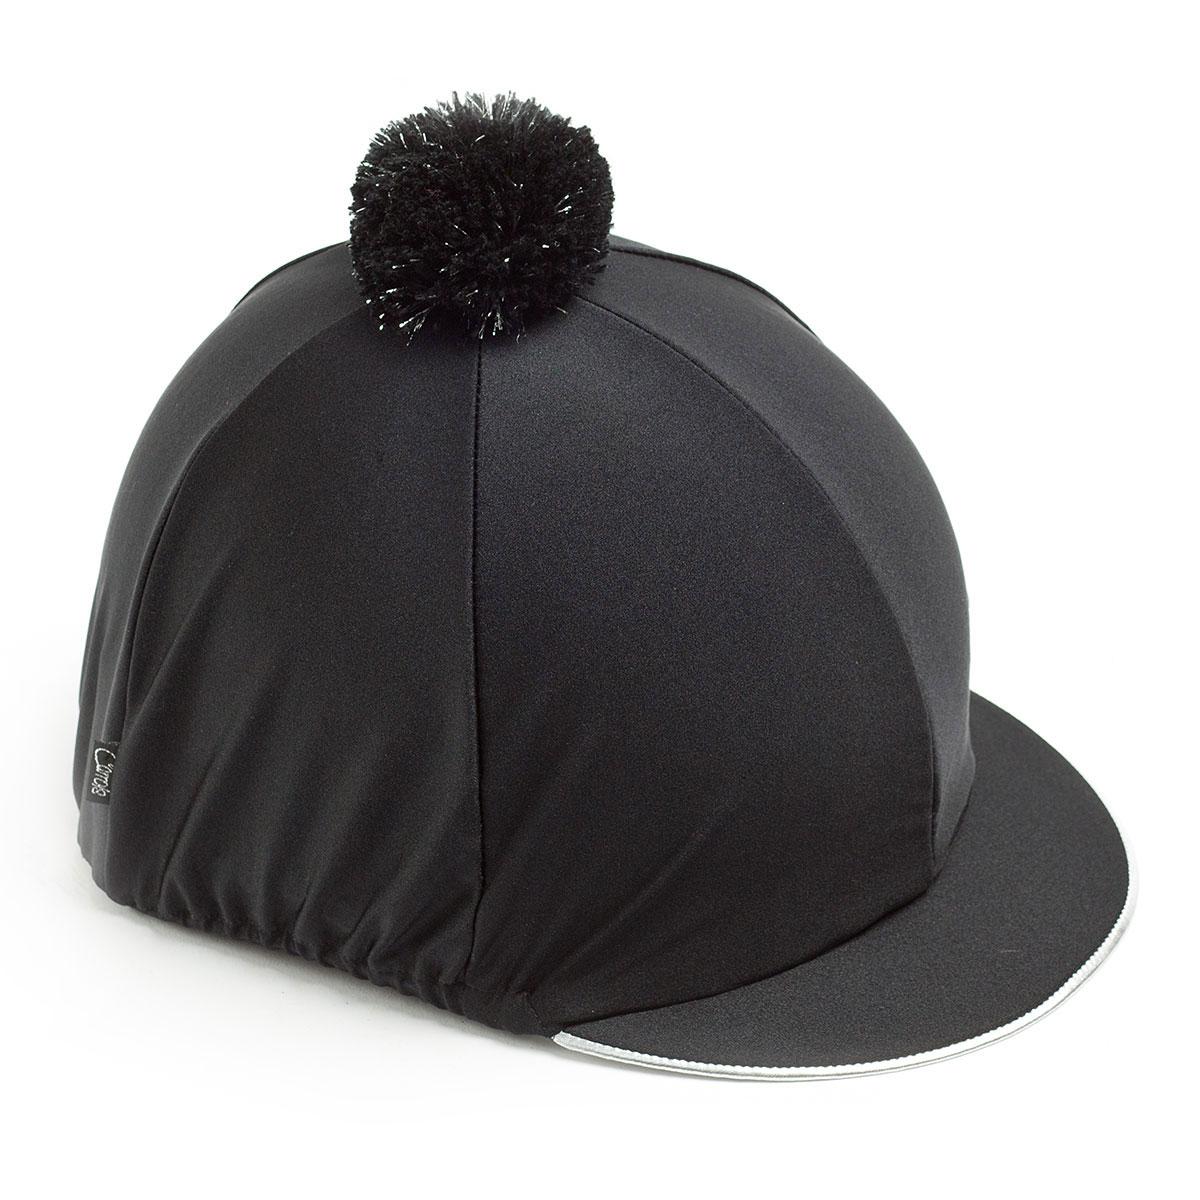 Carrots Plain Black With Silver Trim Hat Cover